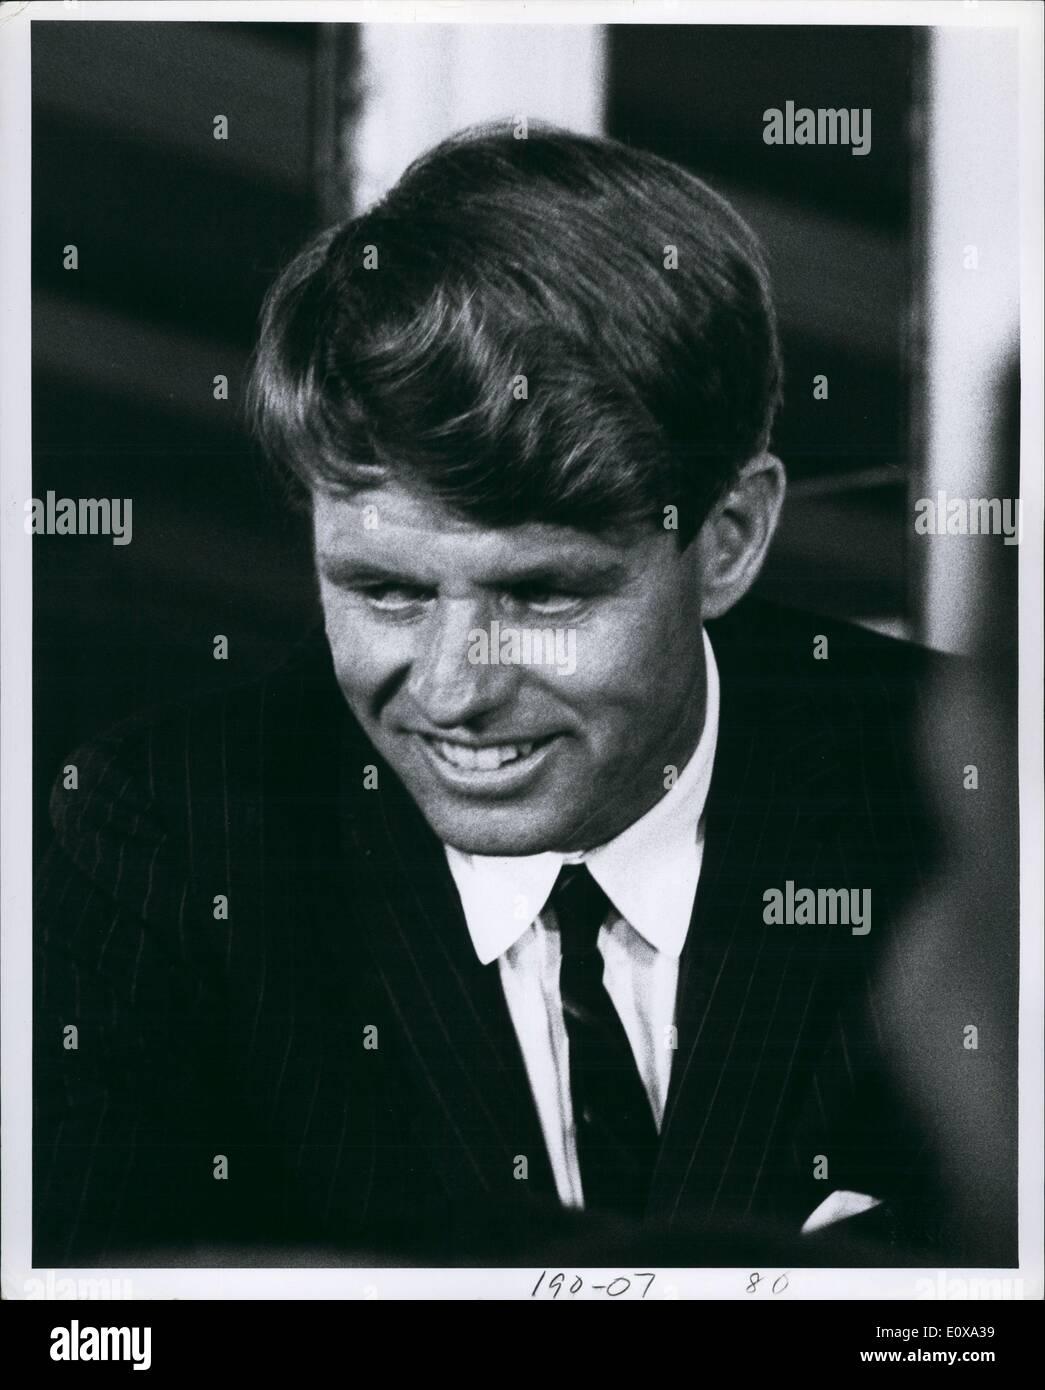 Dec. 00, 1966 - Rfk at Samuel Silverman Campaign New York 1966. - Stock Image